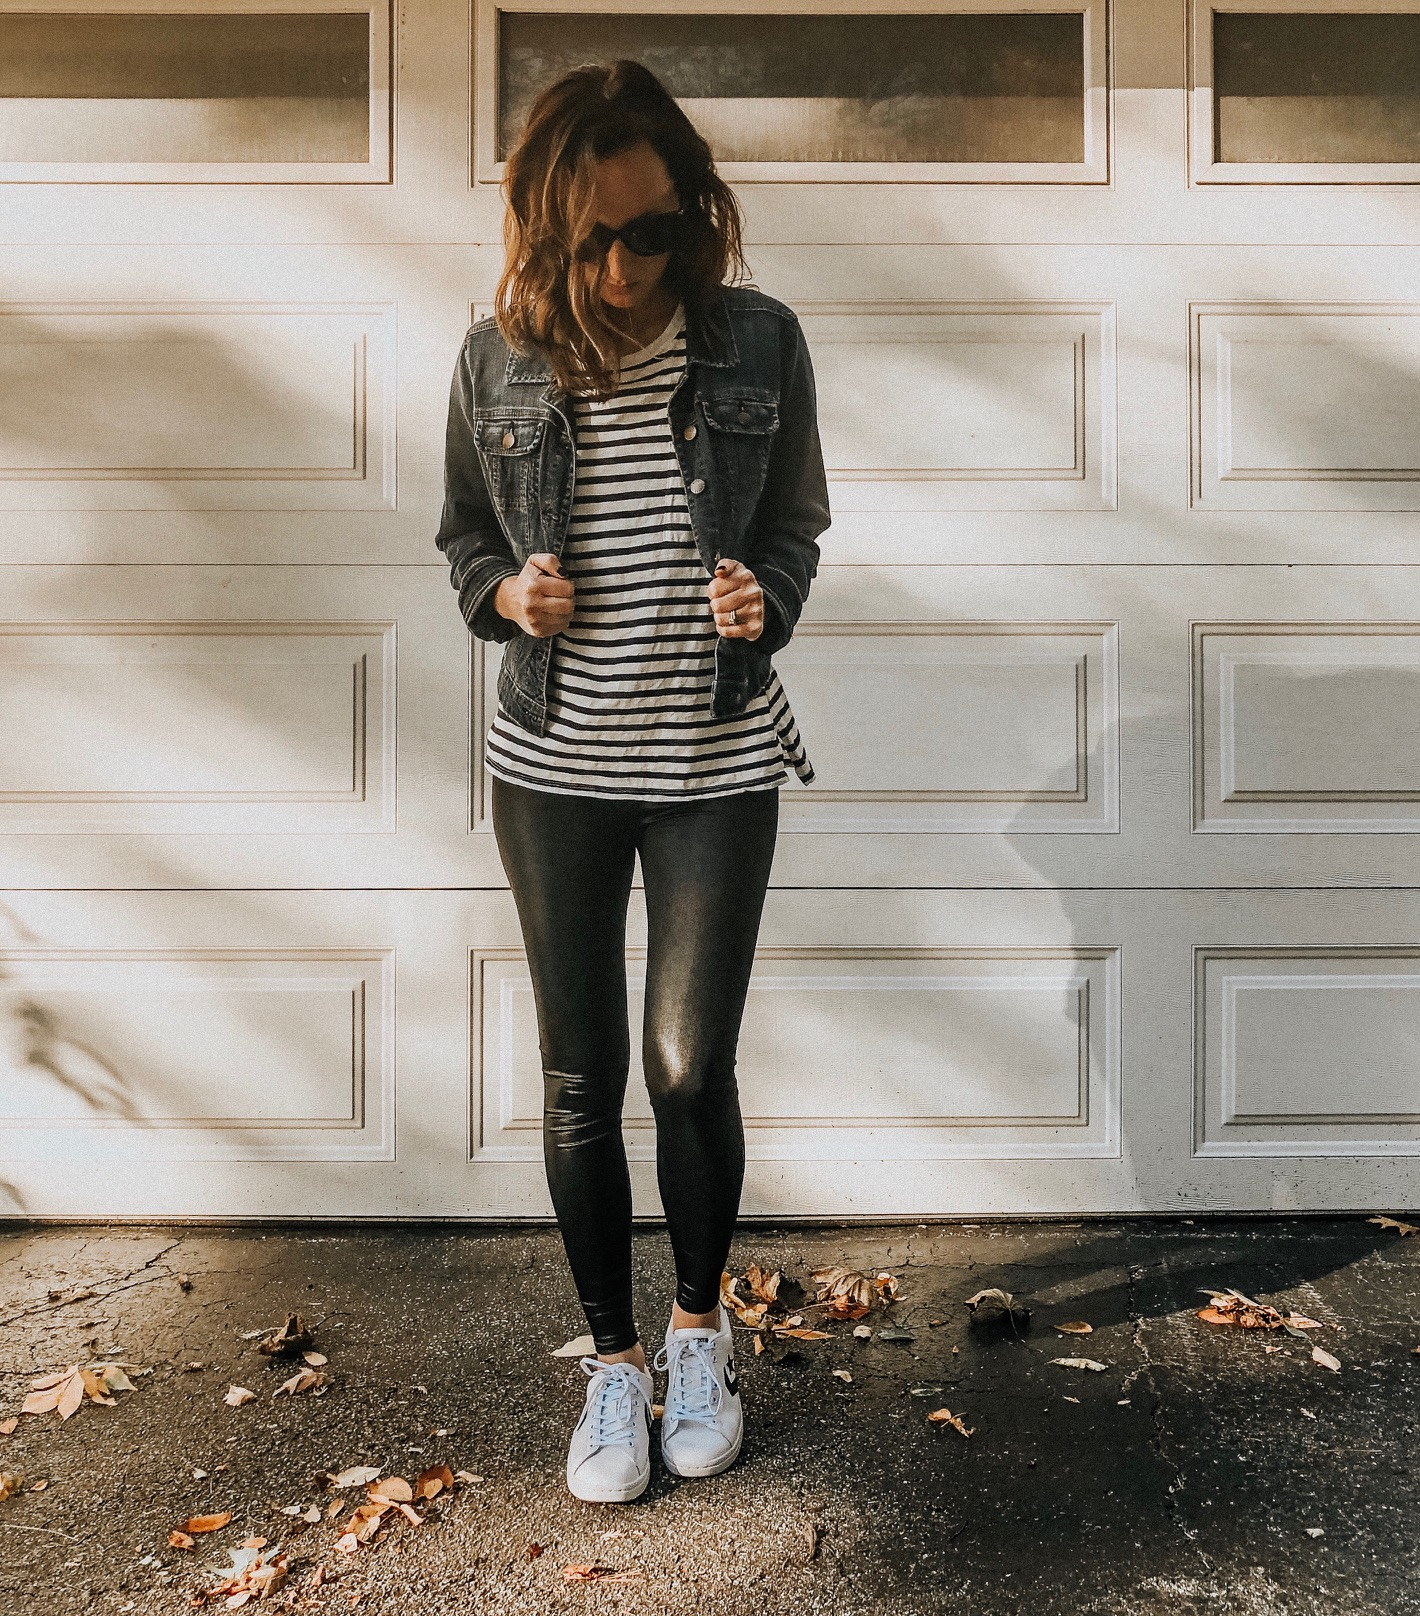 Daily Splendor | Life and Style Blog. Casual look with faux leather leggings #fallfashion #momfashion #casuallook #fashionblog